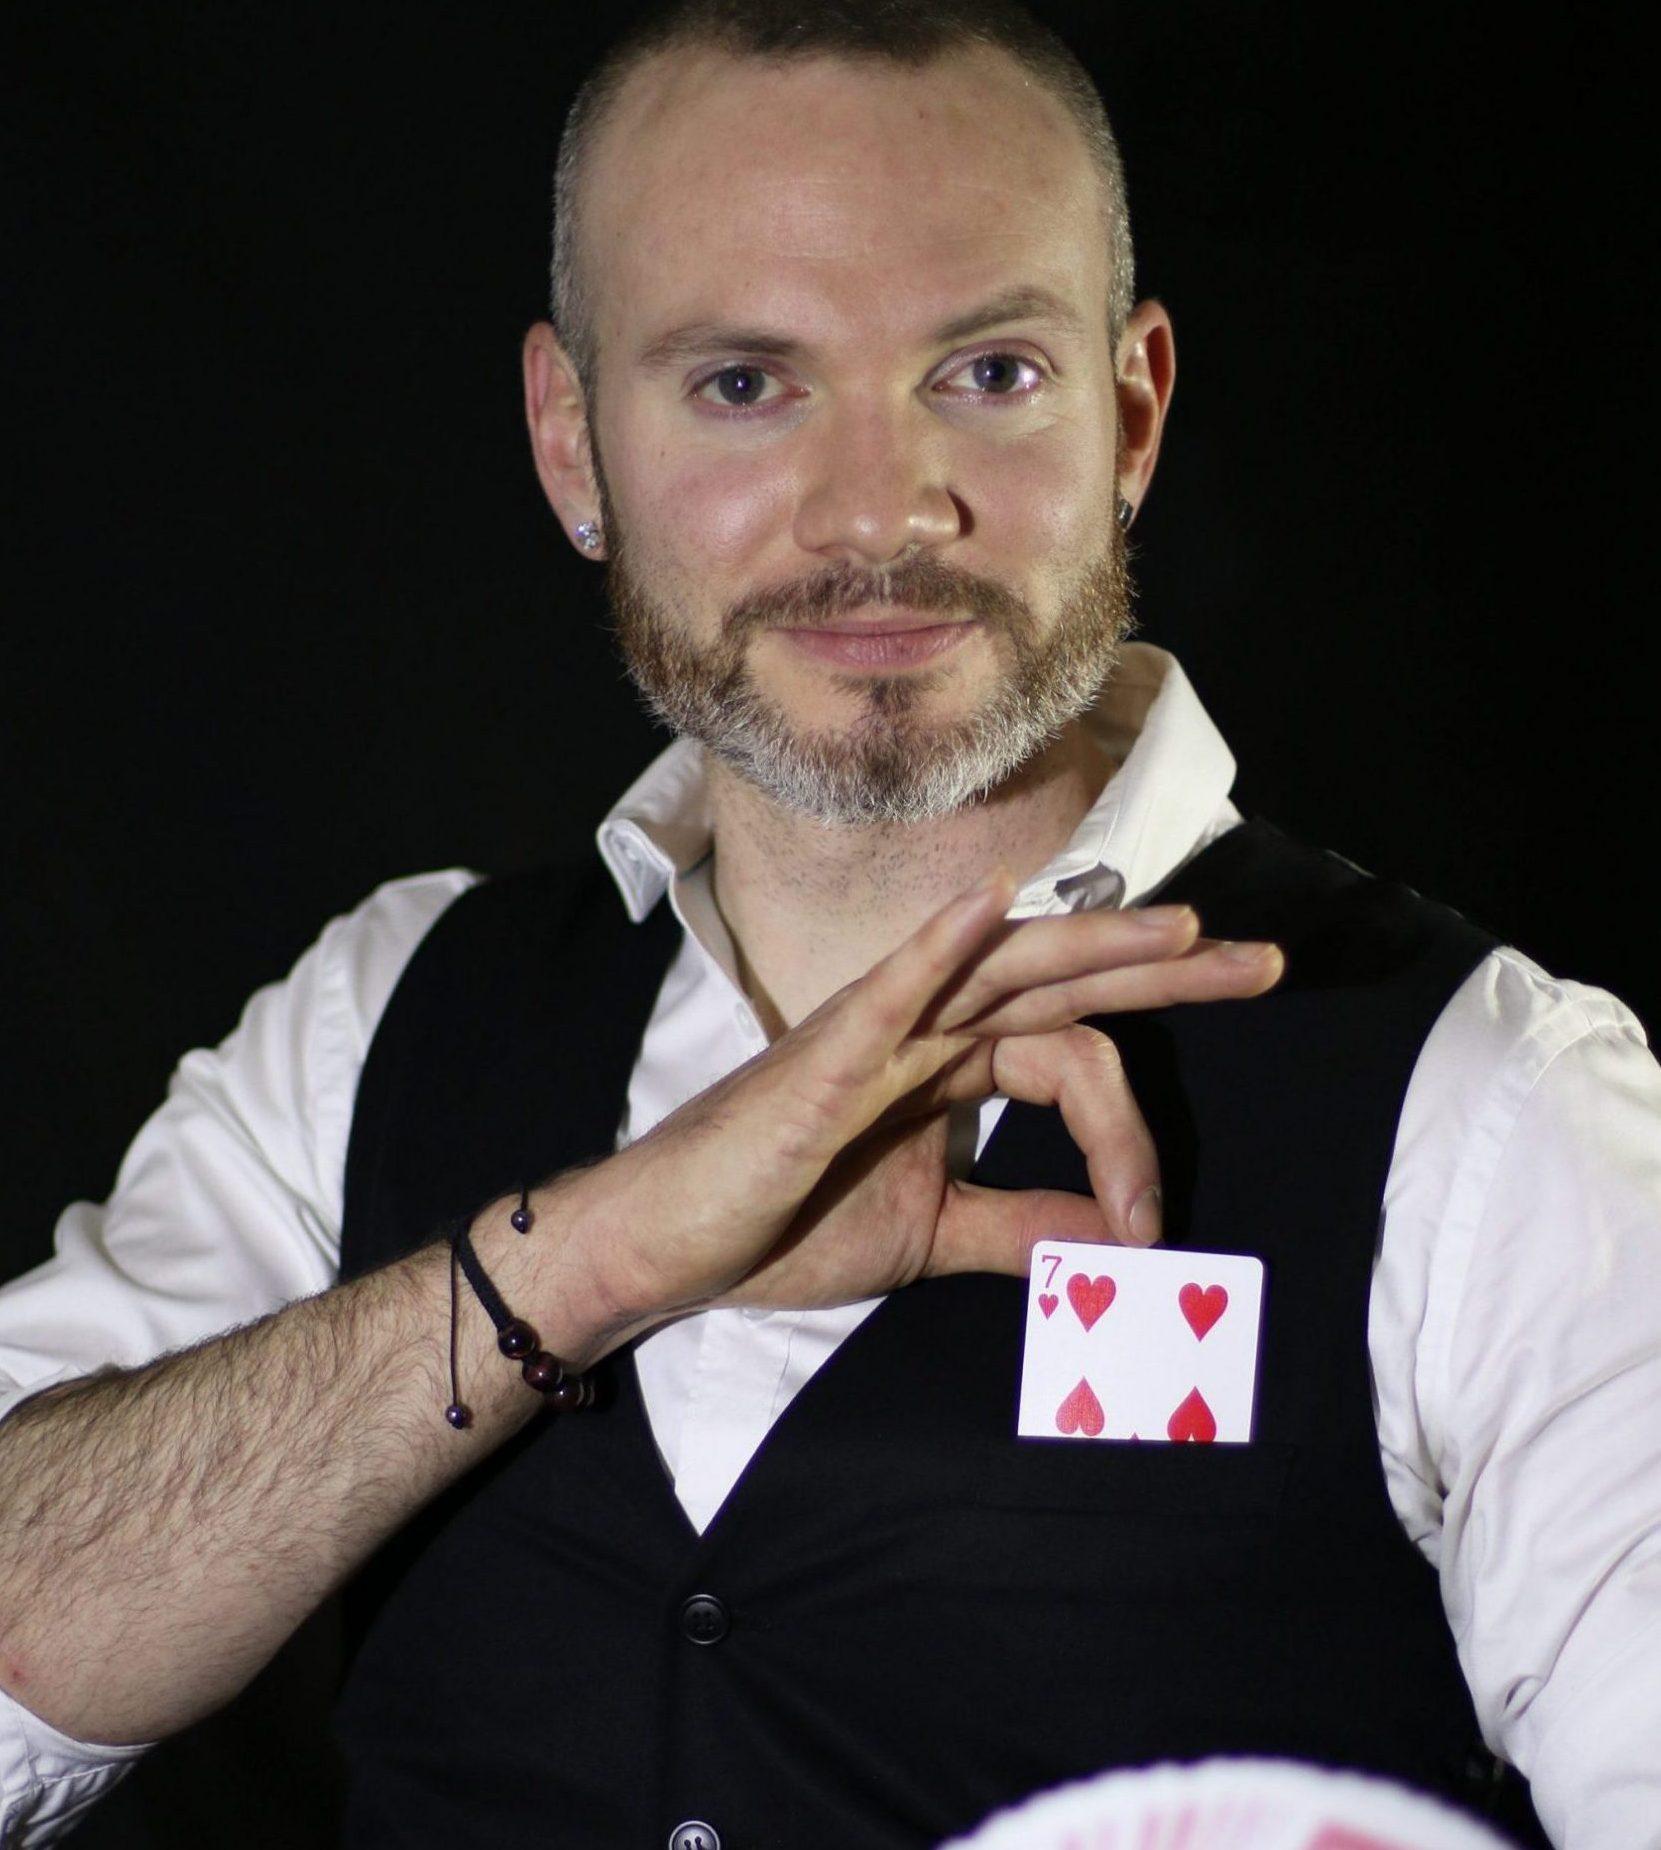 magicien-particulier-enzo-stark